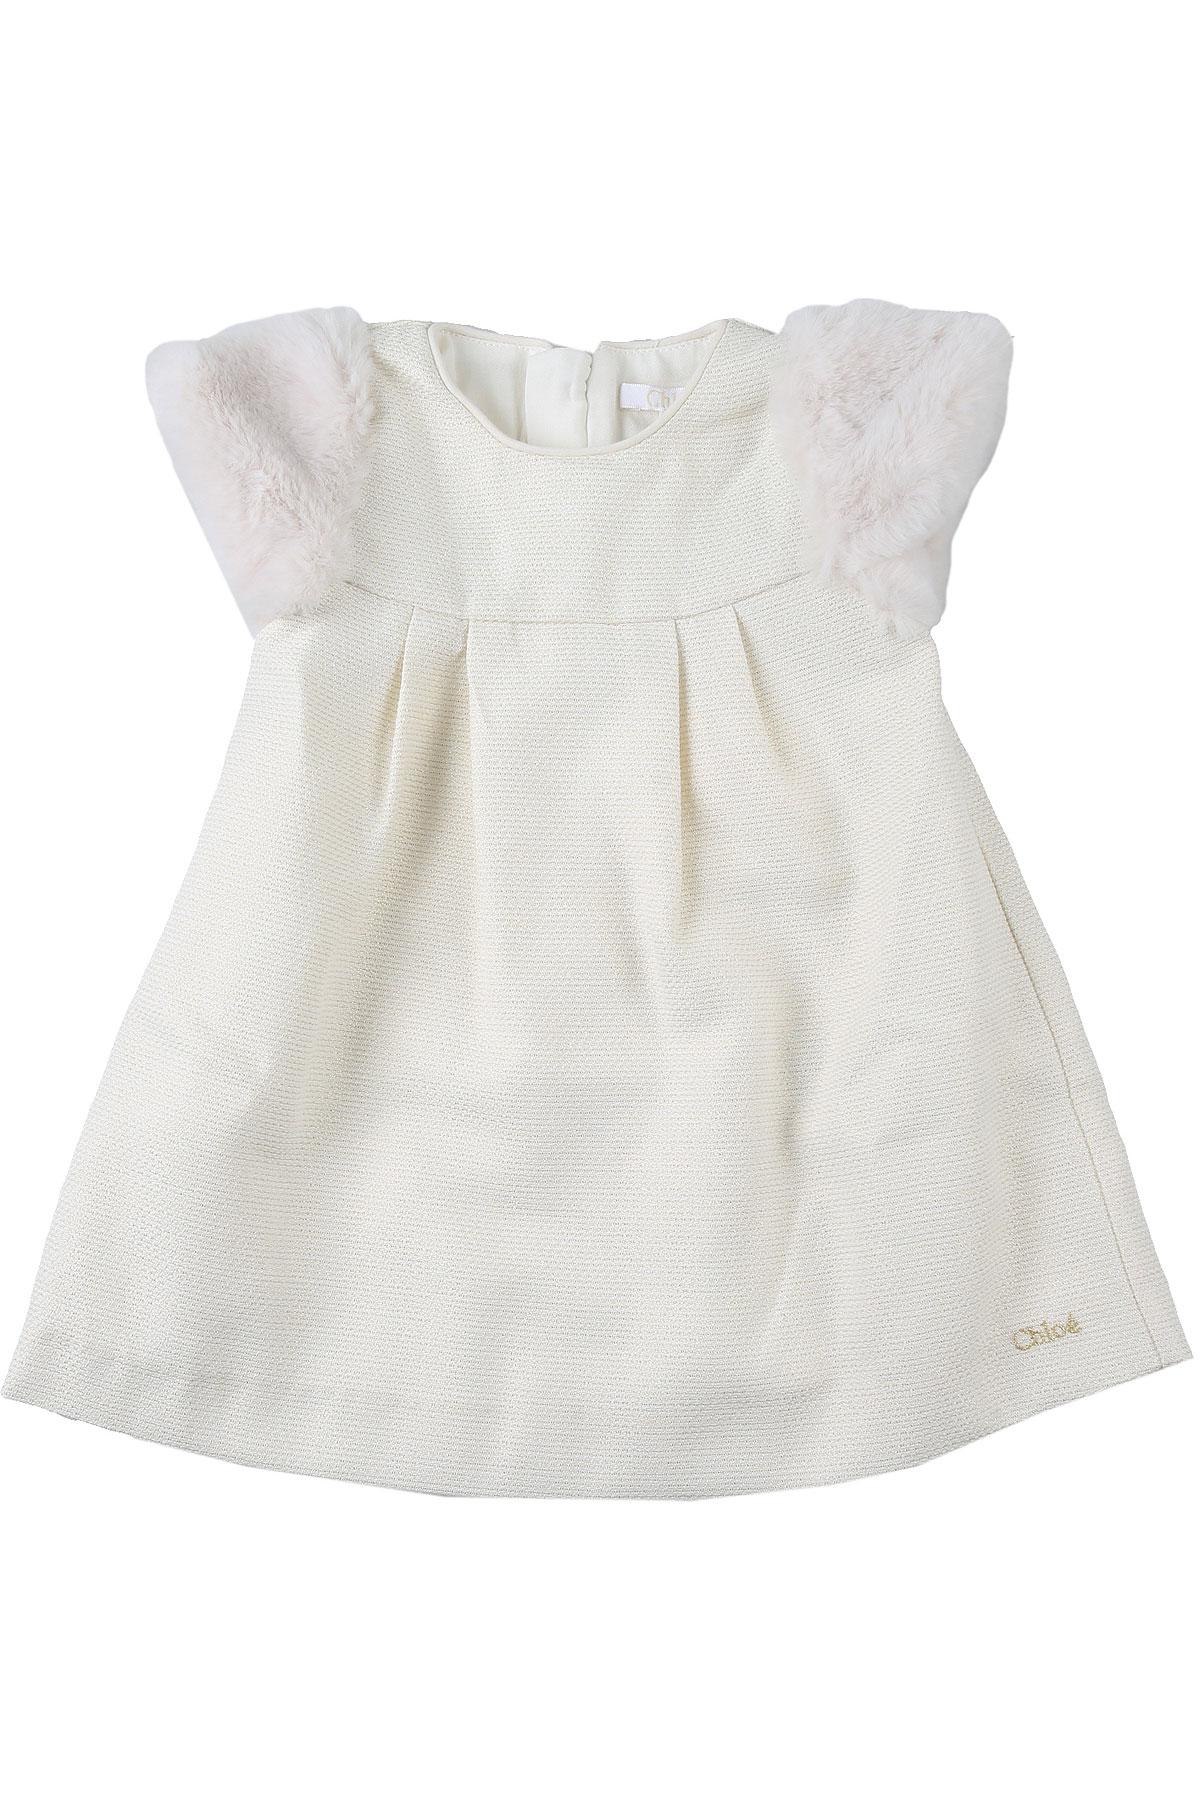 Chloe Baby Dress for Girls On Sale, Milk, polyester, 2019, 12M 18M 3Y 6M